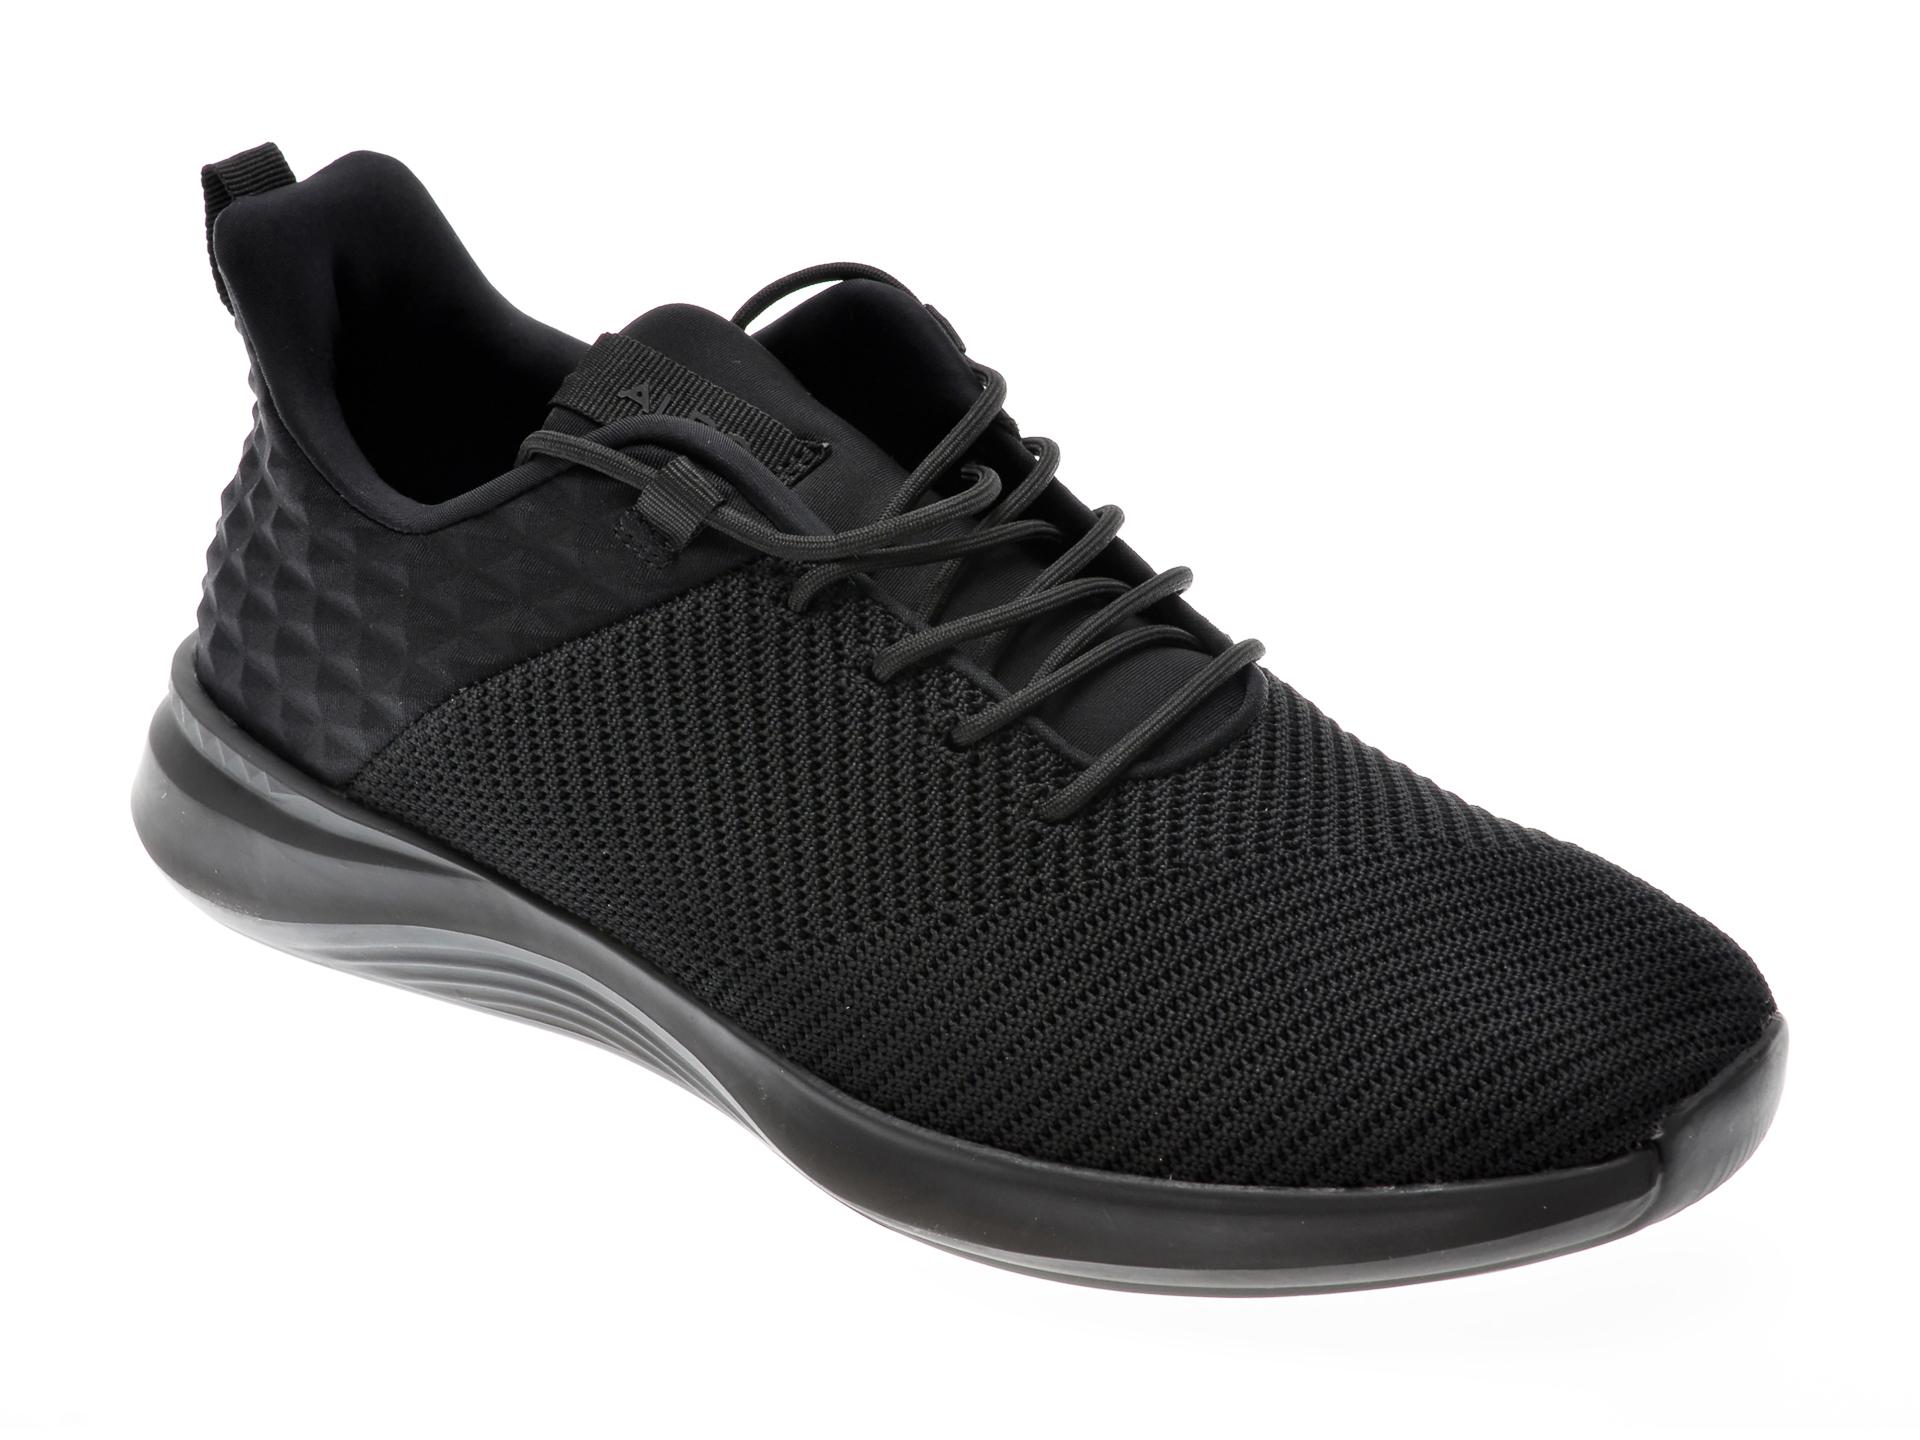 Pantofi Sport Aldo Negri, Rpplclear1a008, Din Material Textil